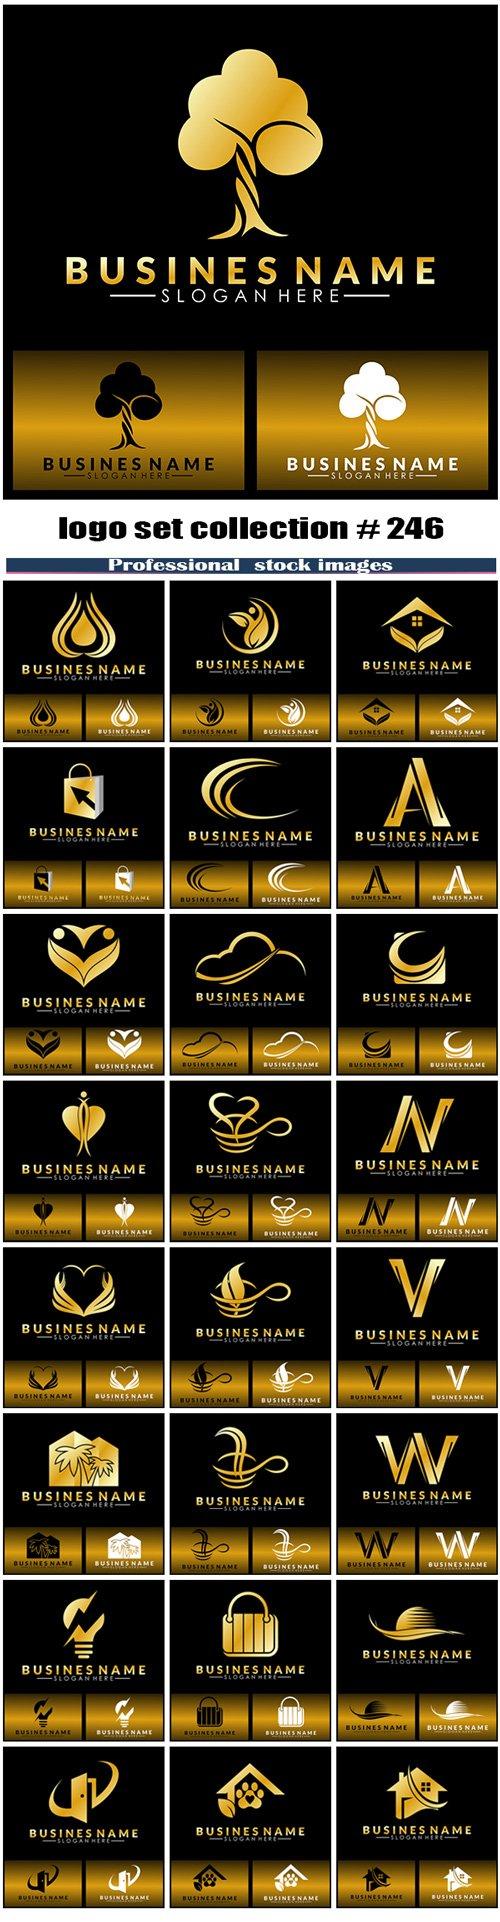 logo set collection # 246